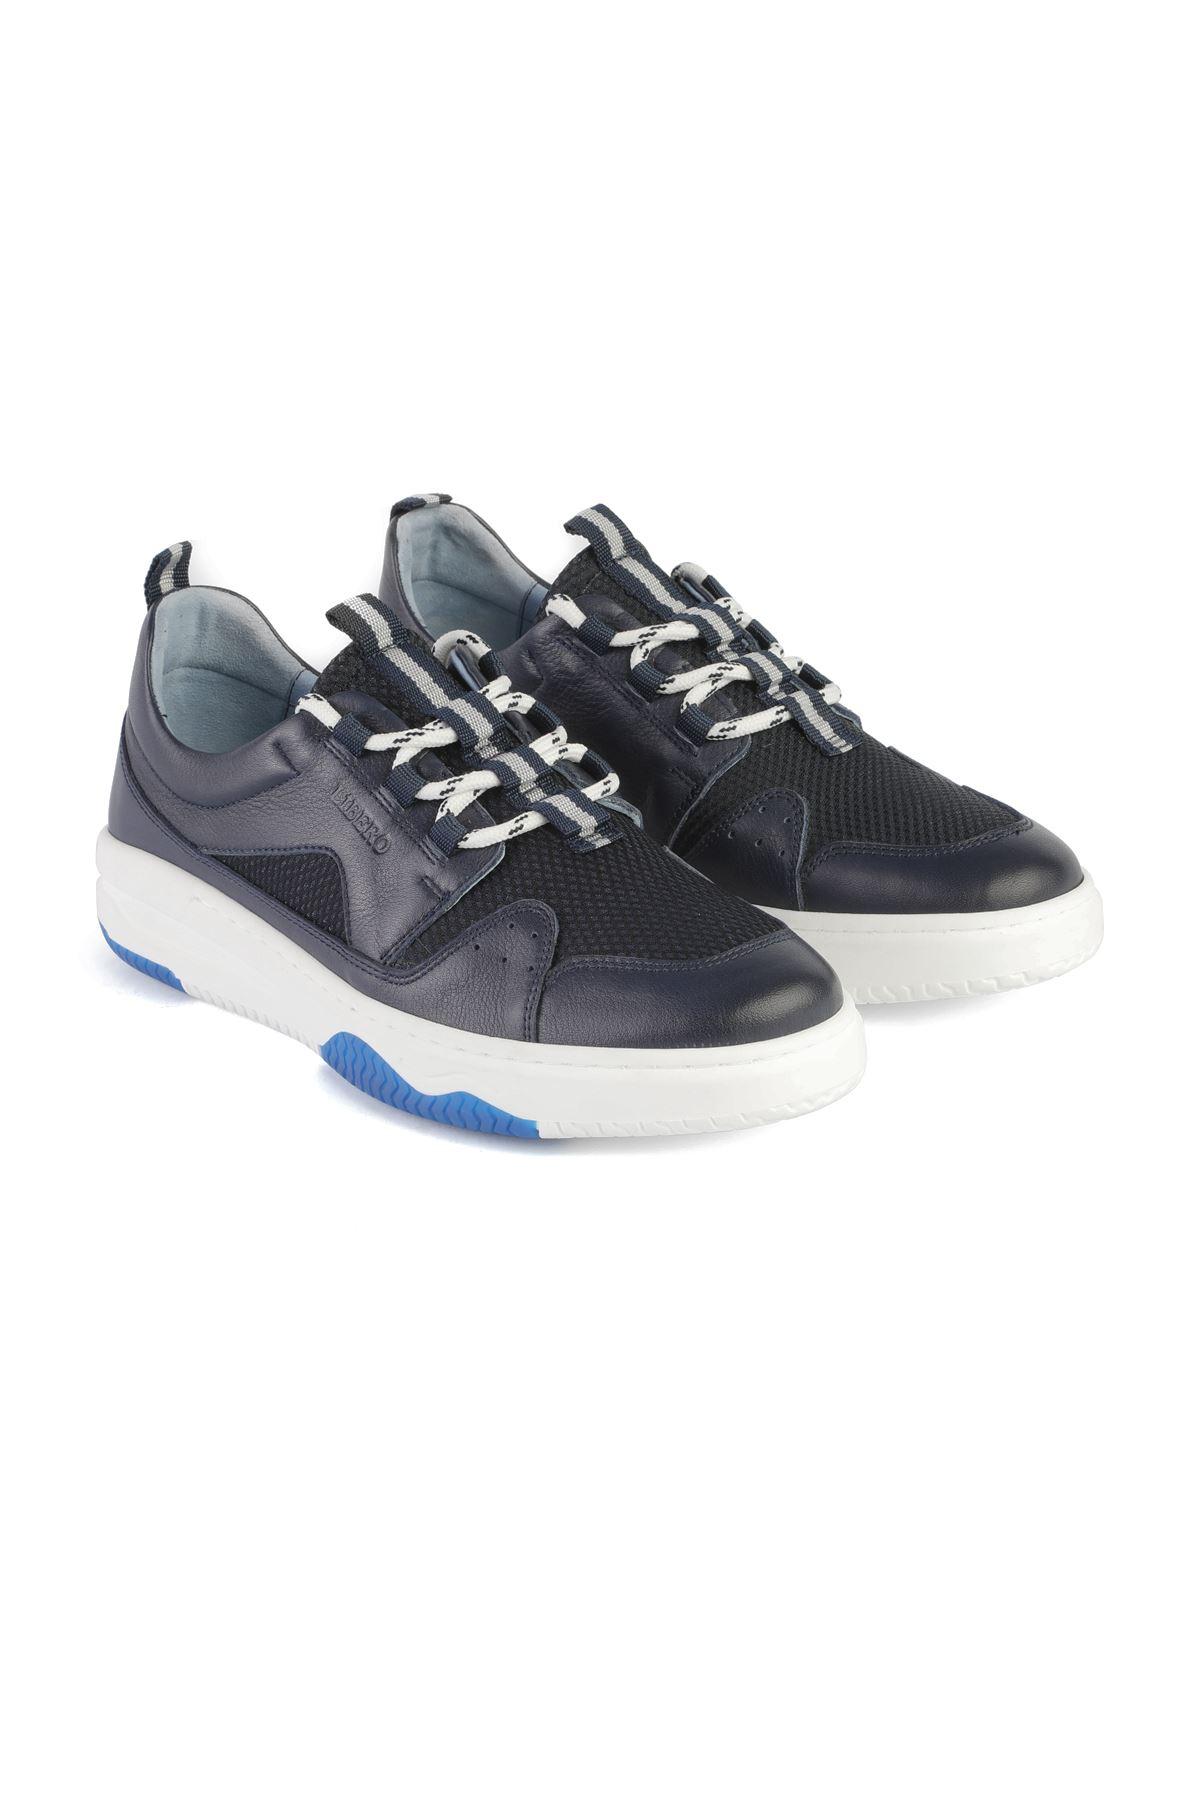 Libero 3341 Navy Blue Sport Shoes